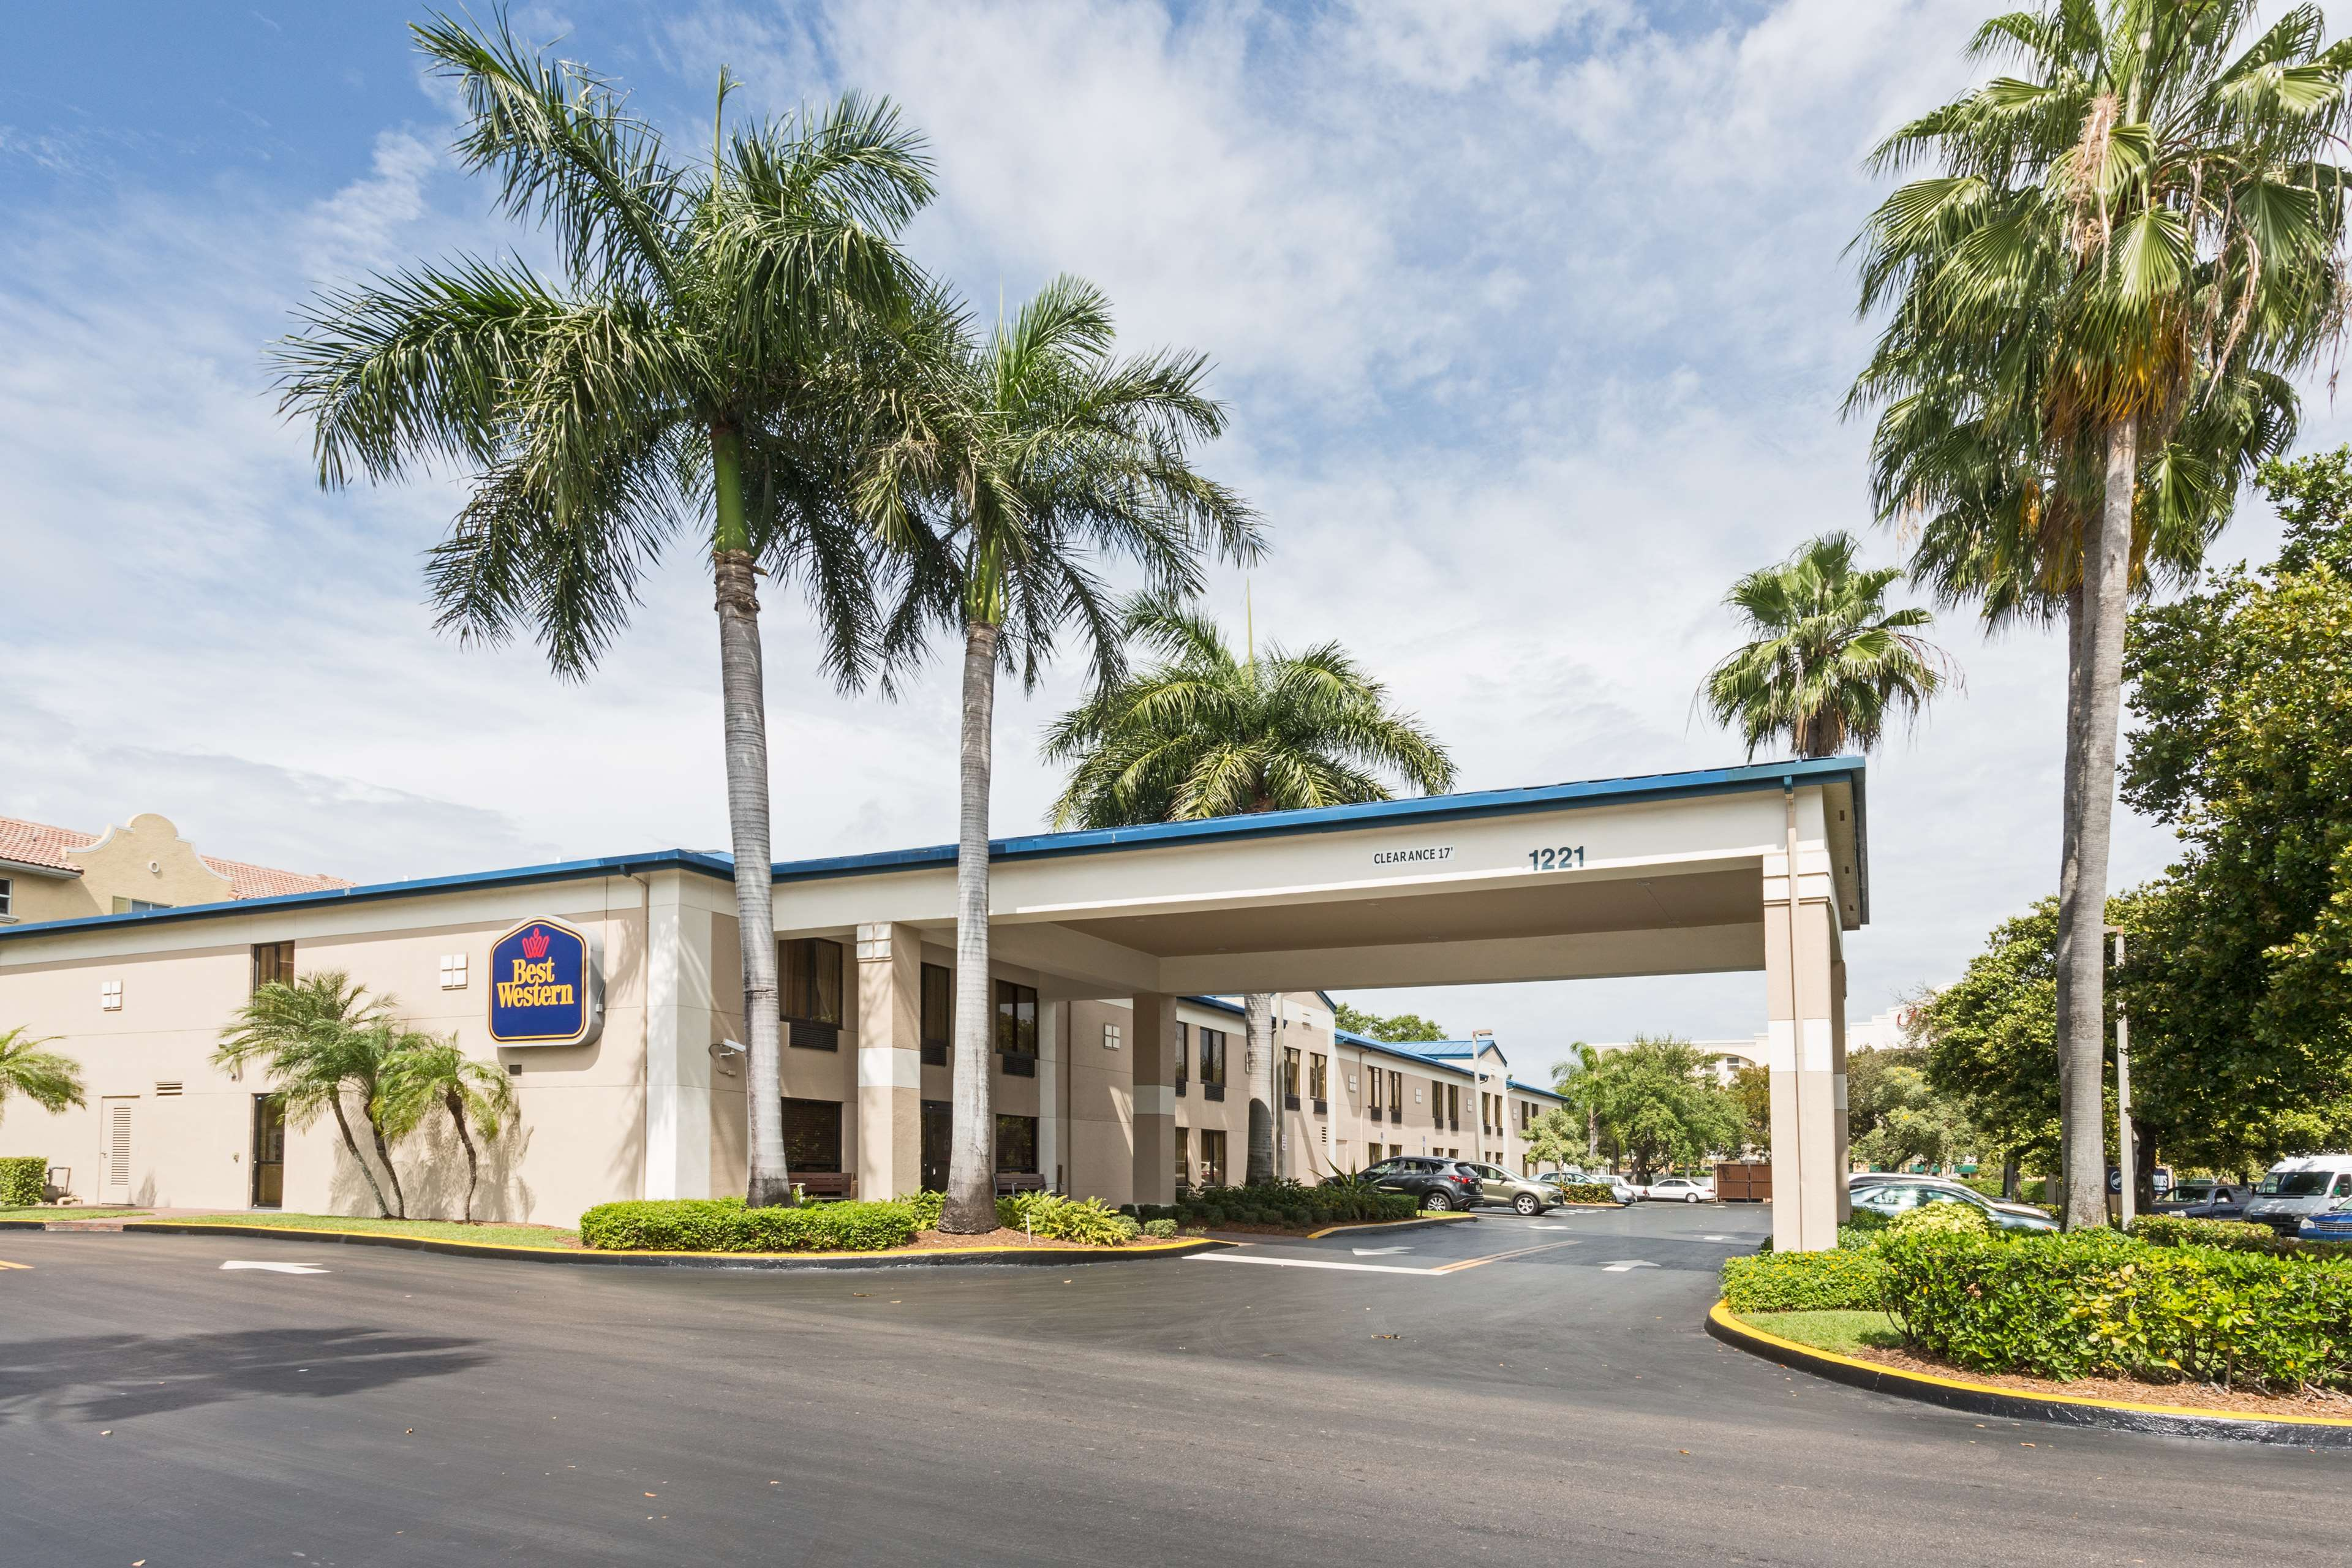 Best Western Hotel Ft Lauderdale Airport